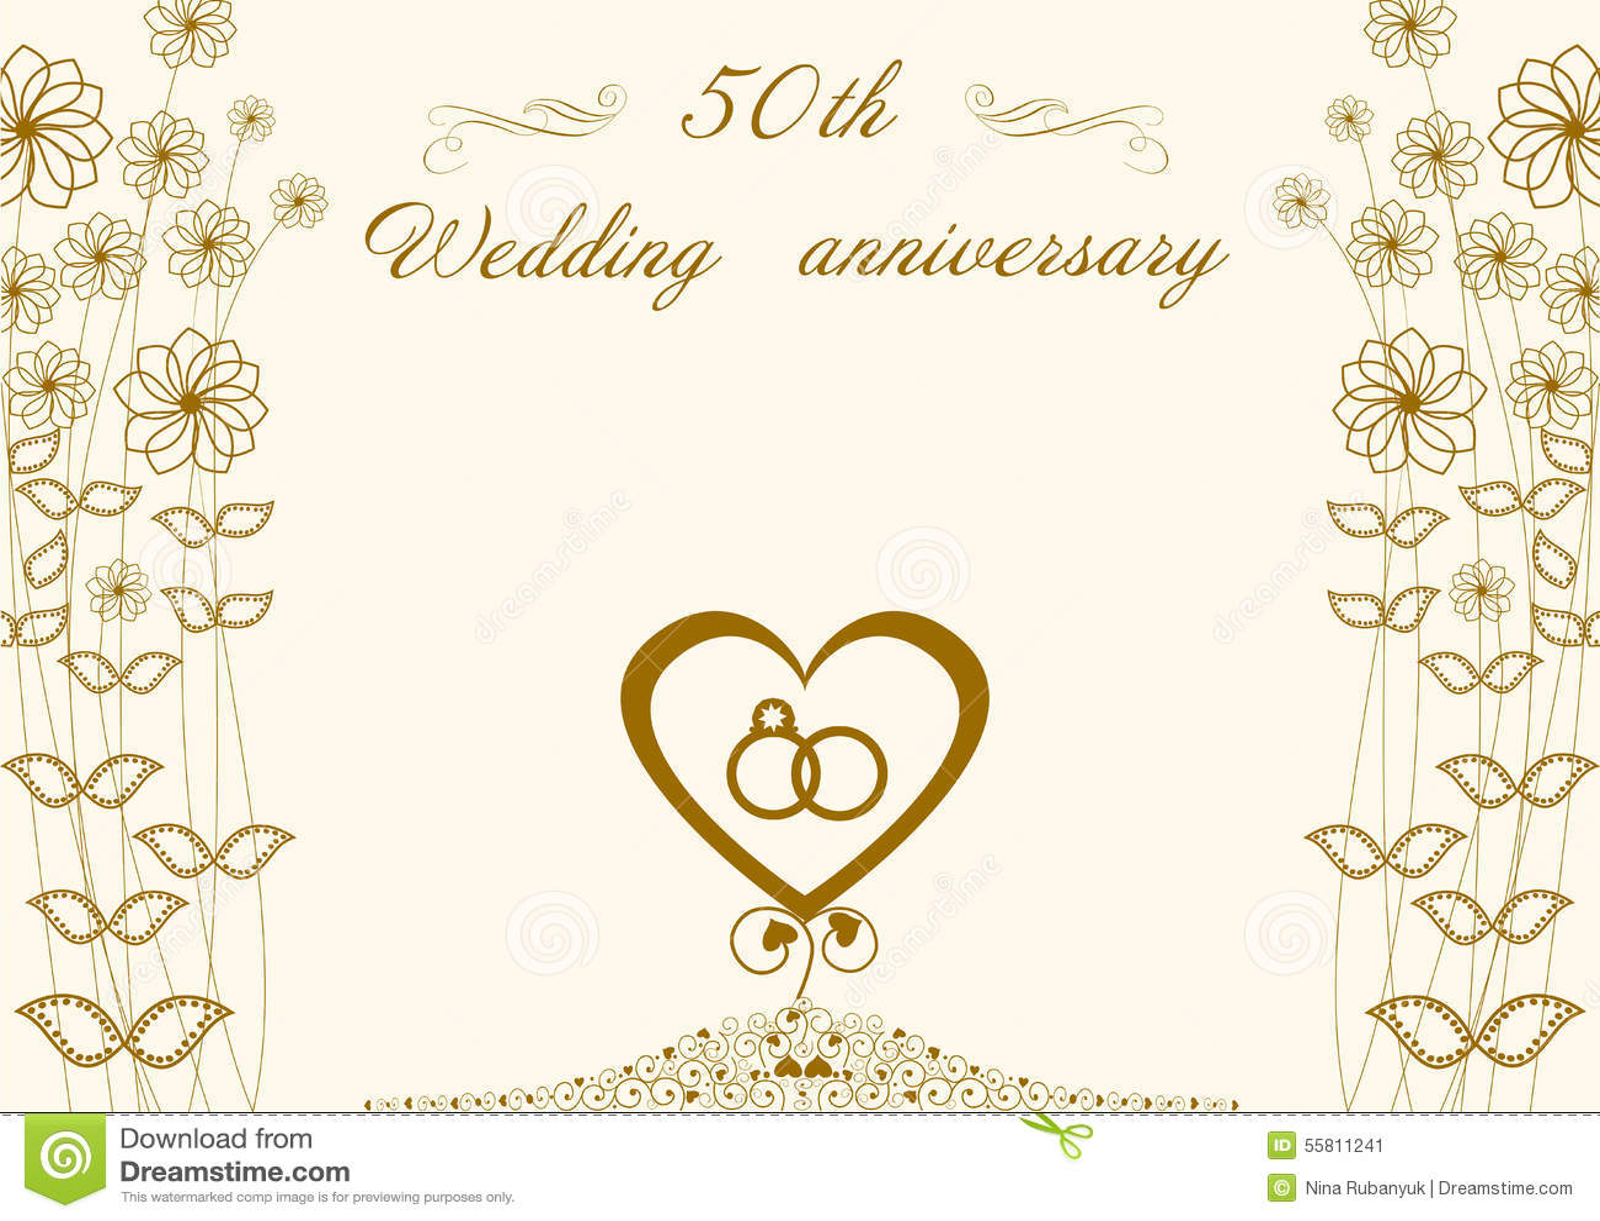 Glückwünsche Zur Goldenen Hochzeit 50 Stock Abbildung